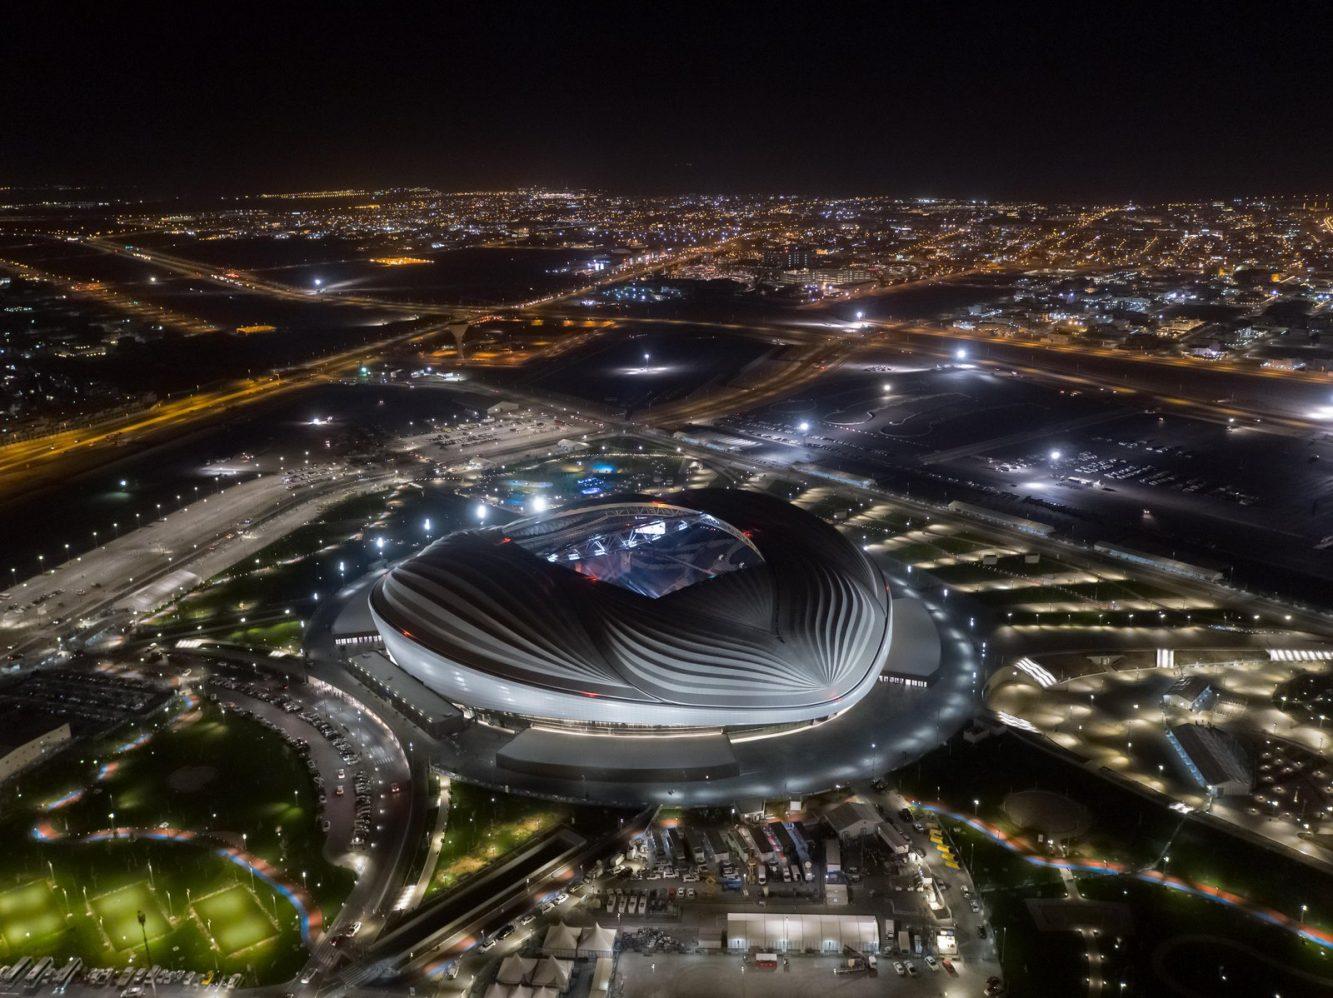 07_Al Janoub Stadium_Al Wakrah_Qatar (Copiar)